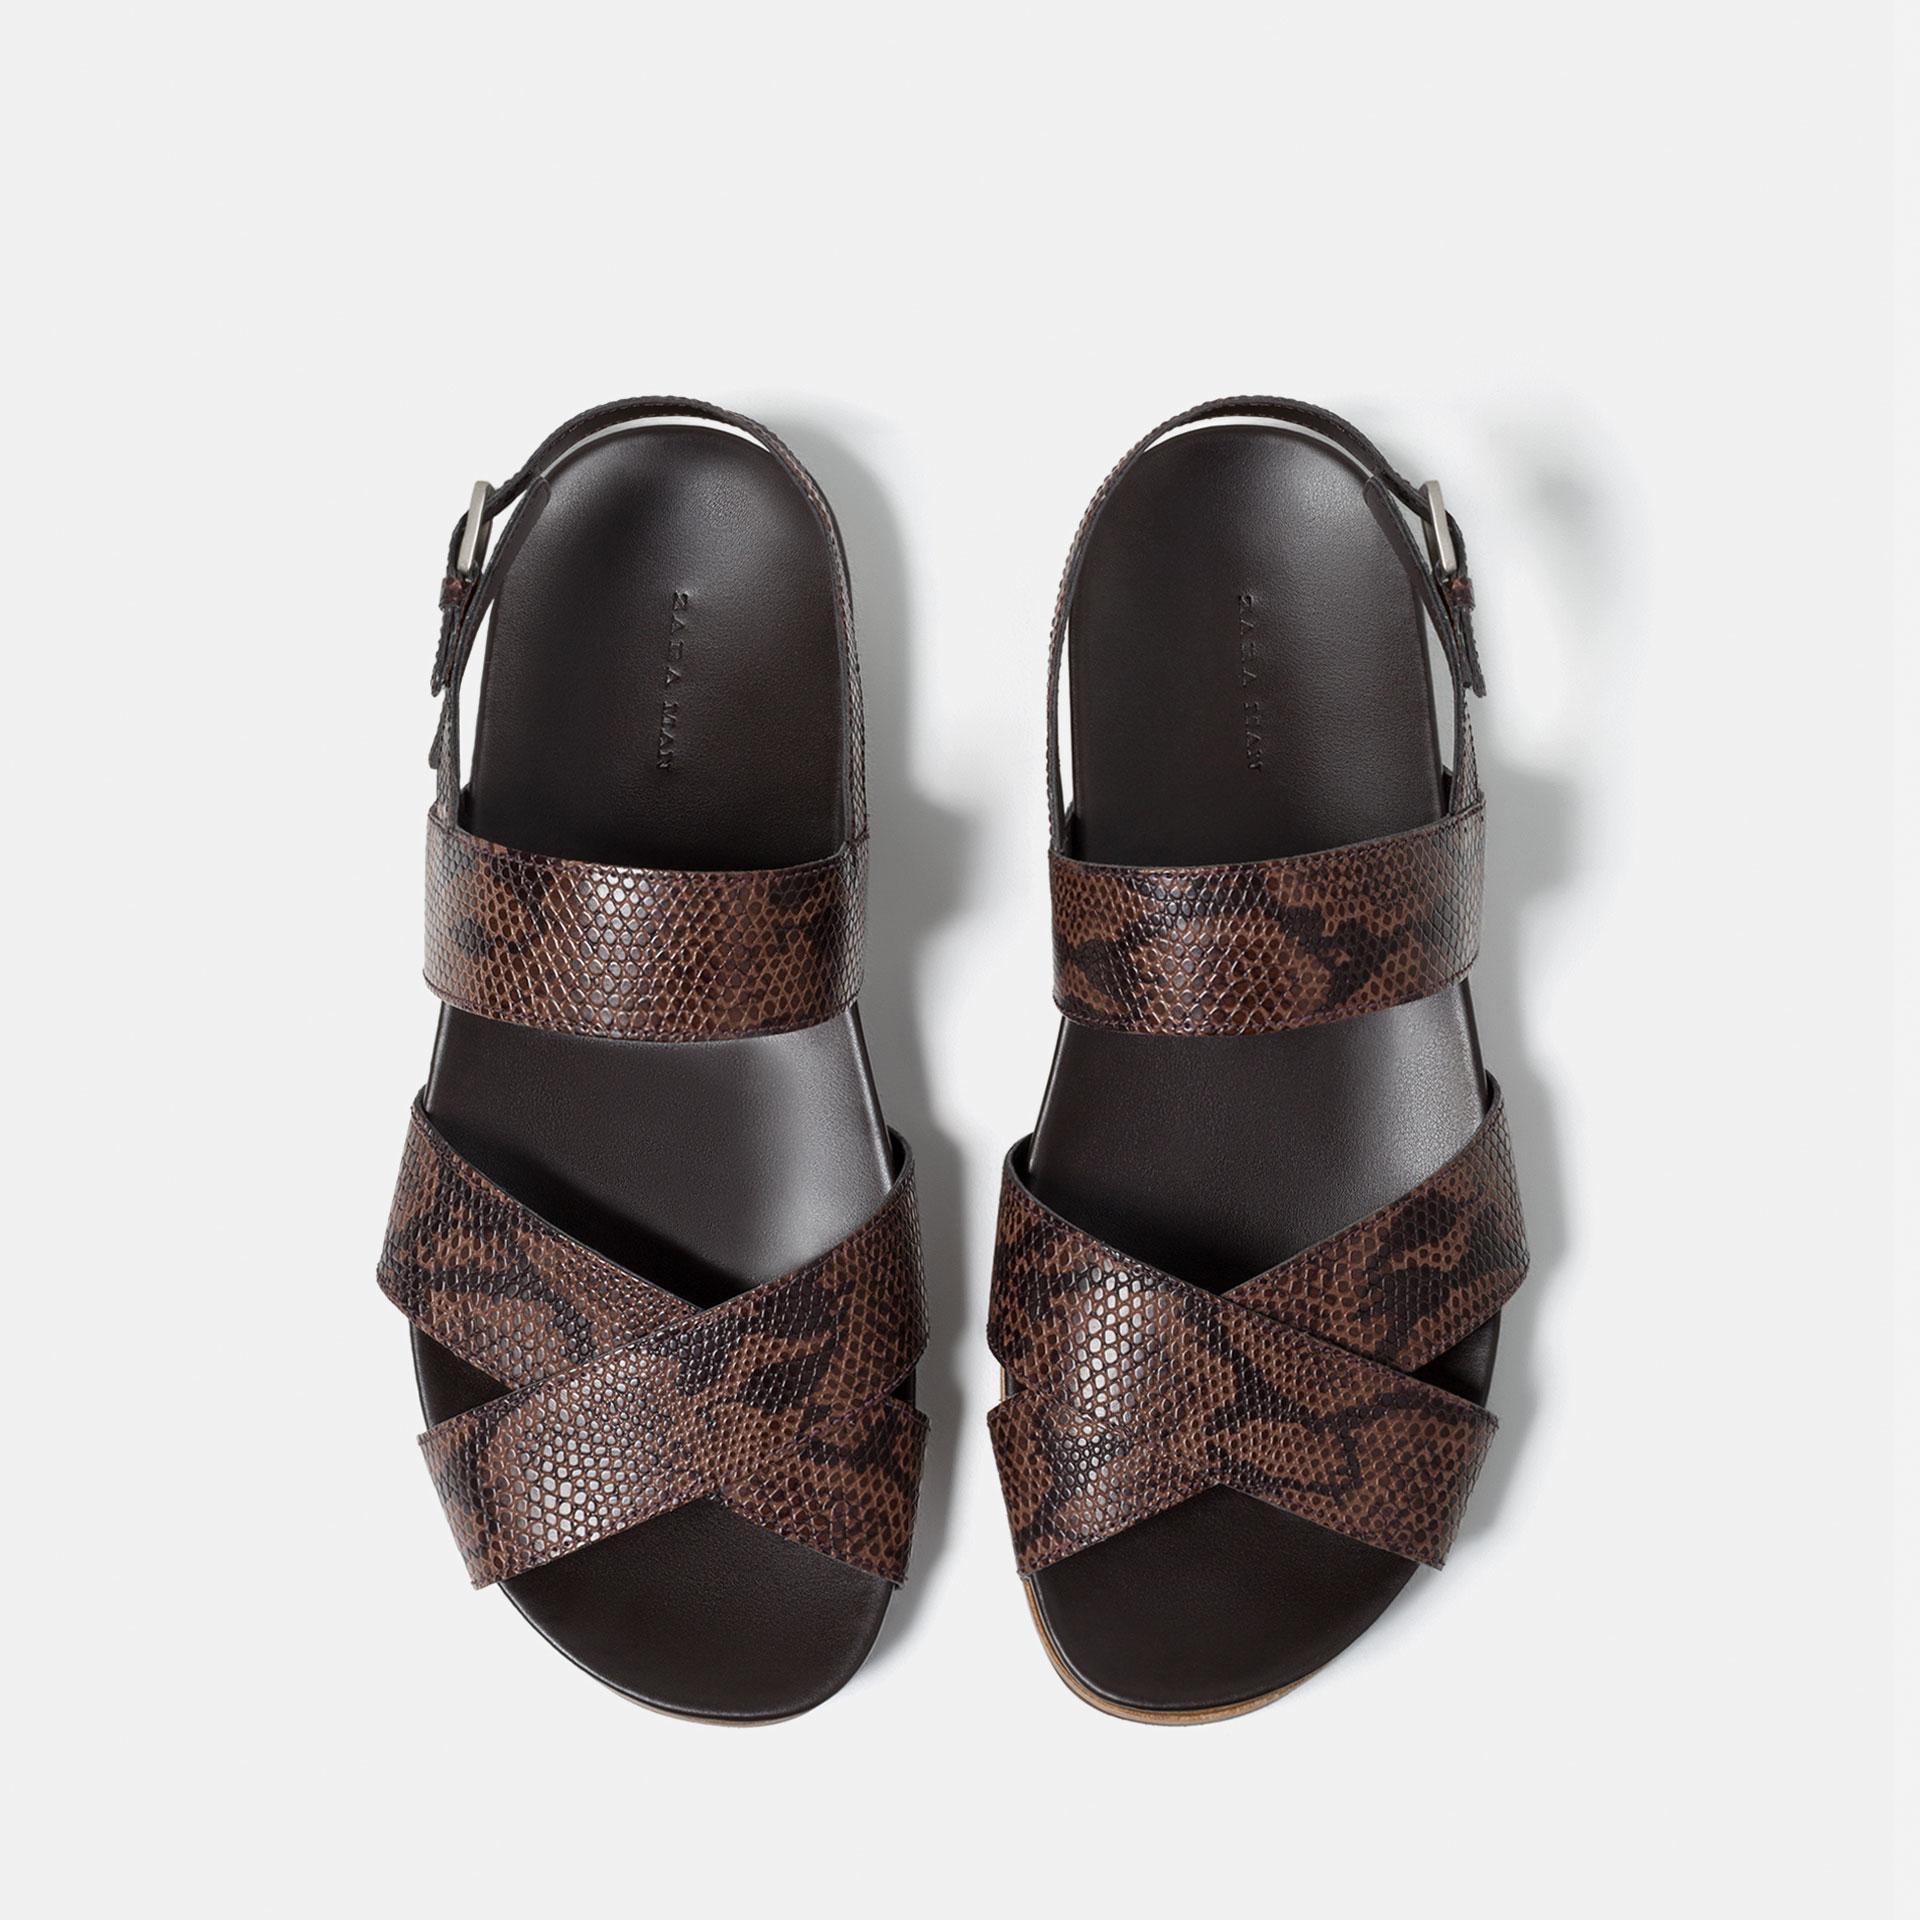 Zara Animal Print Sandals In Brown For Men Lyst